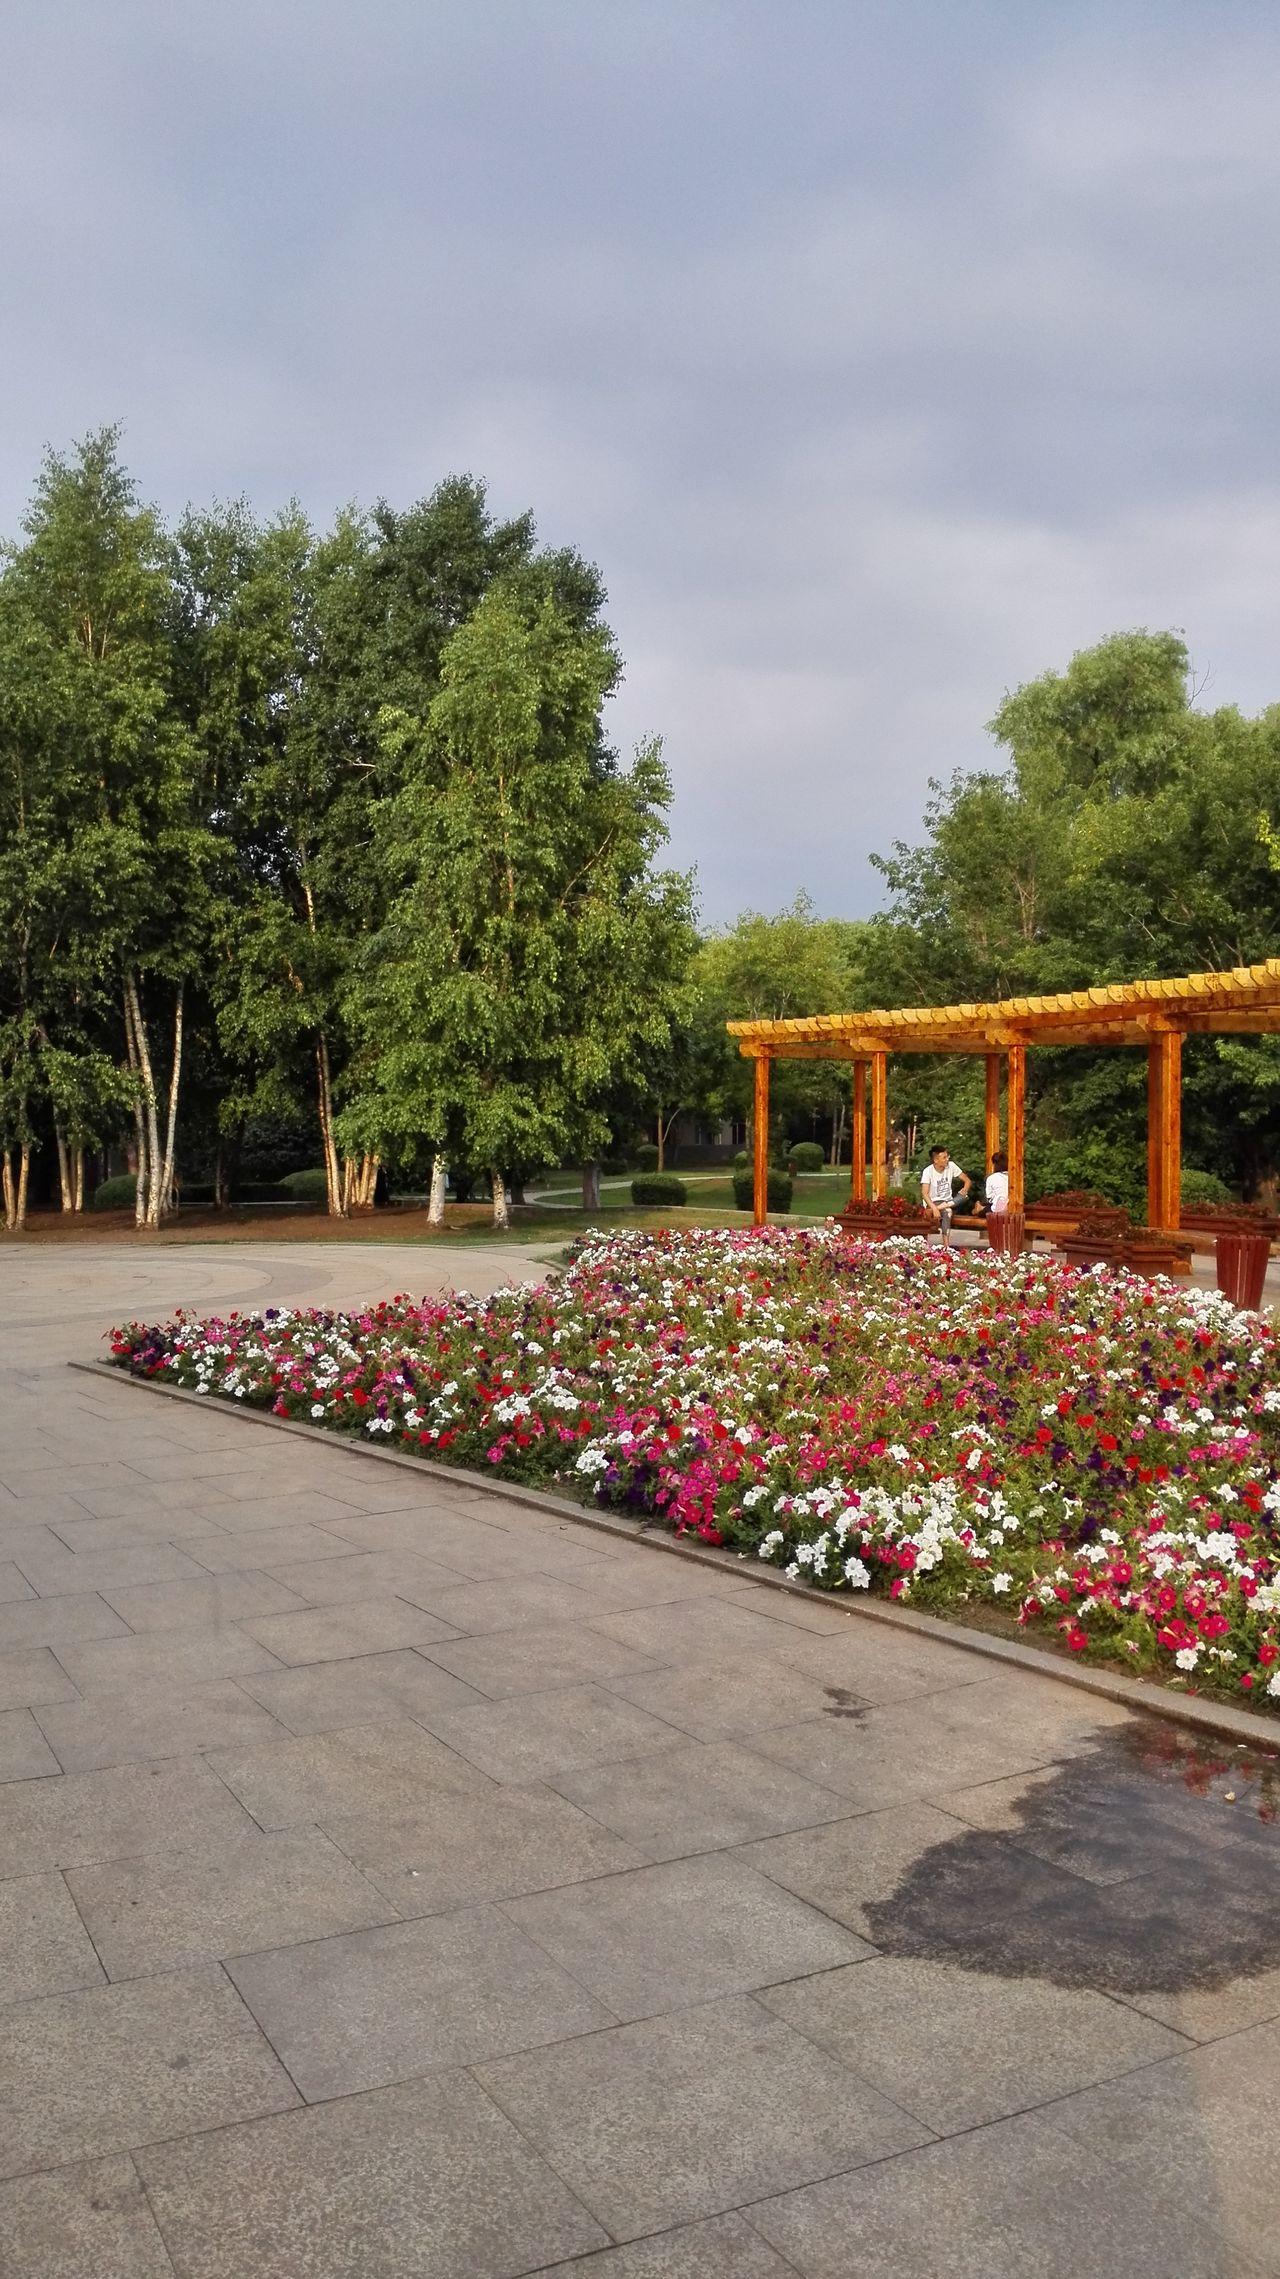 Outdoors Tree Day Flower Travel Destinations Nature Sky China Haerbin